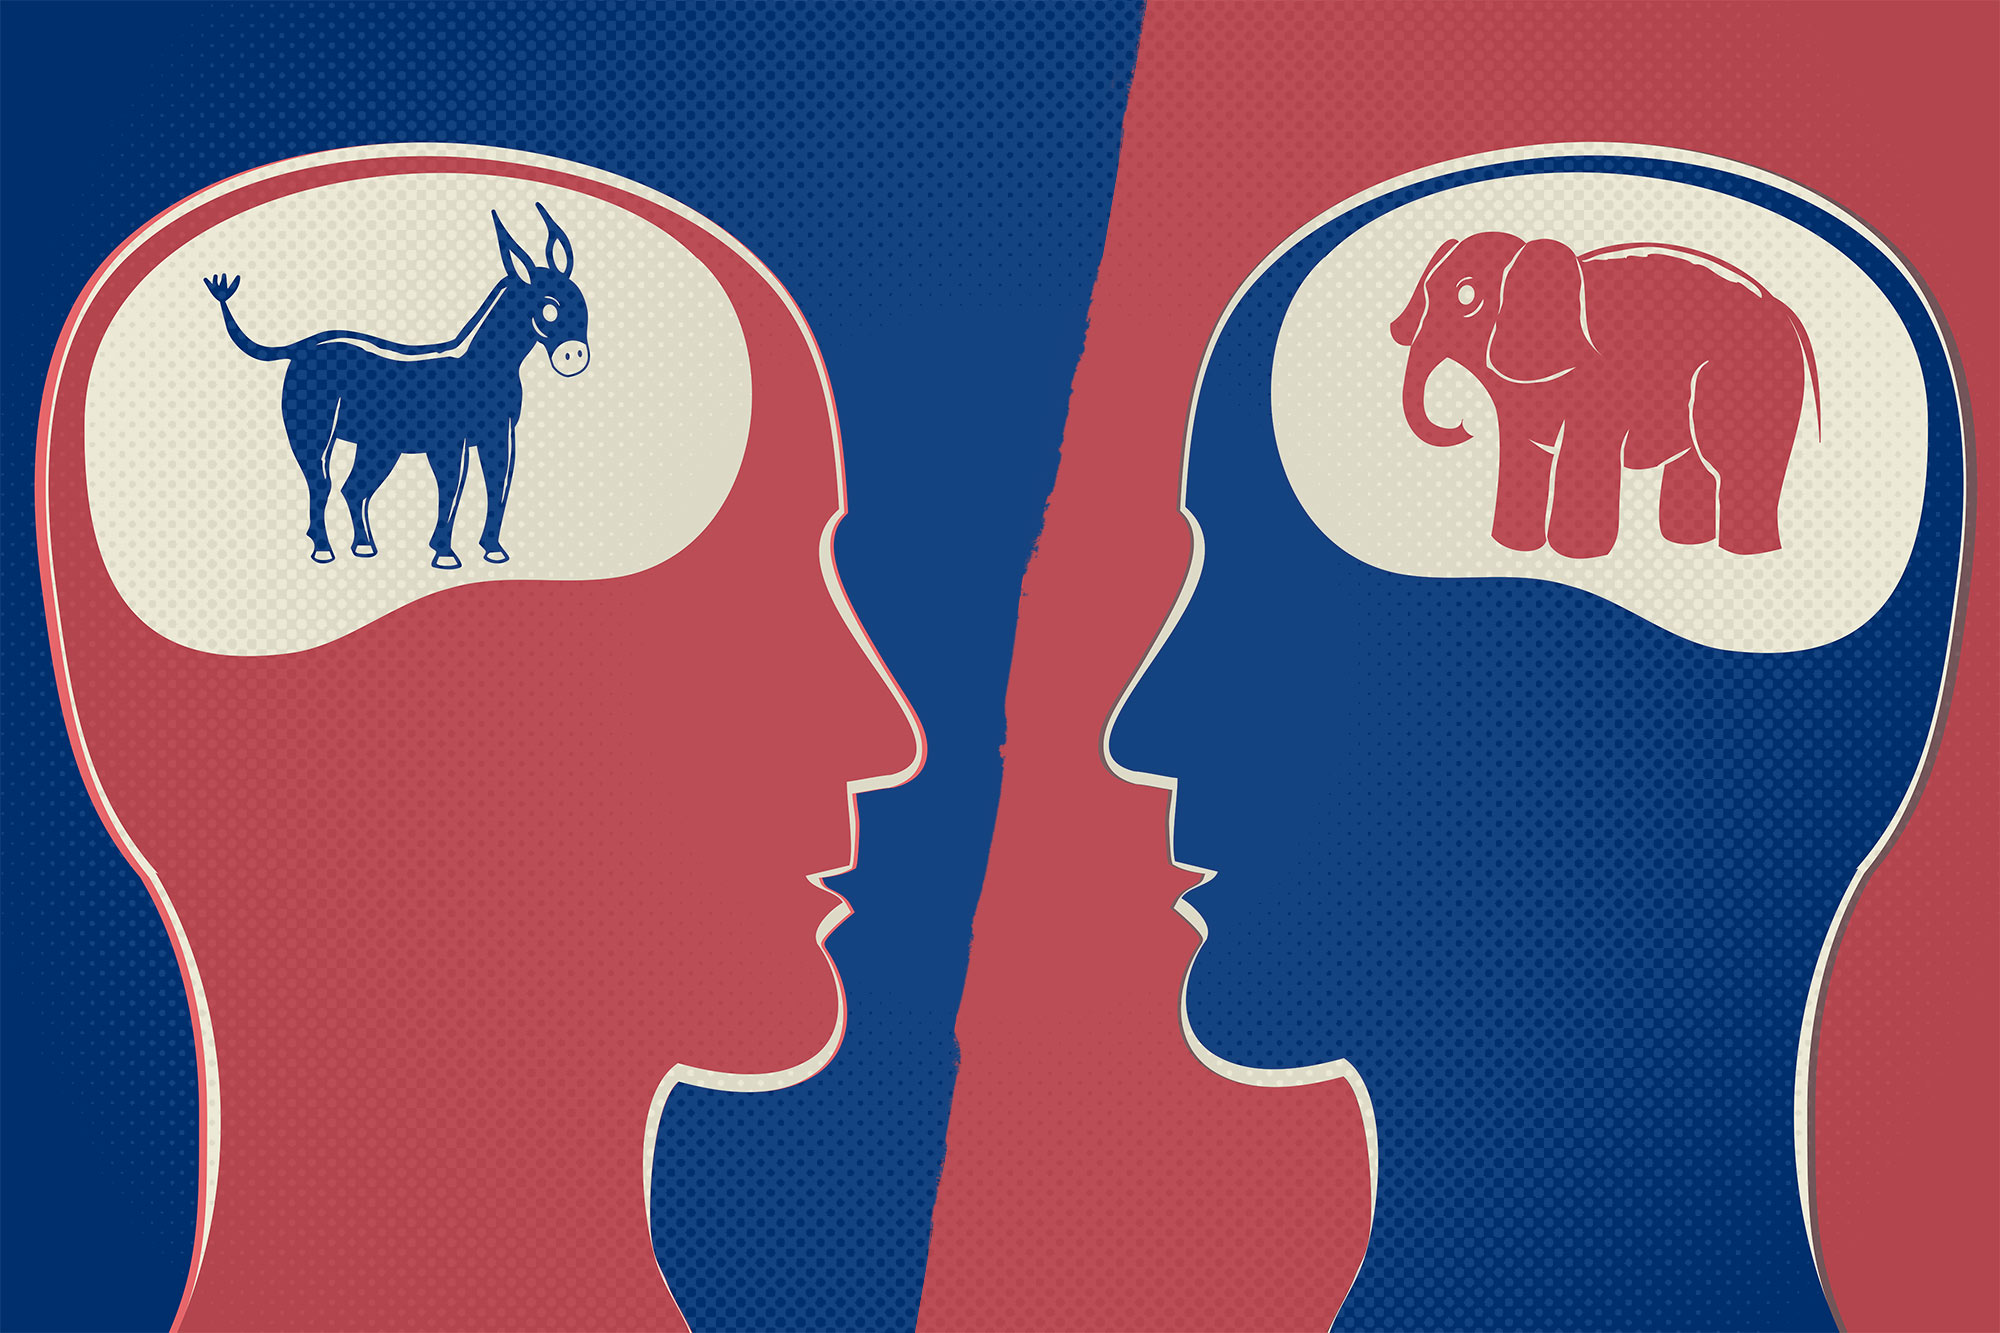 brian on politics